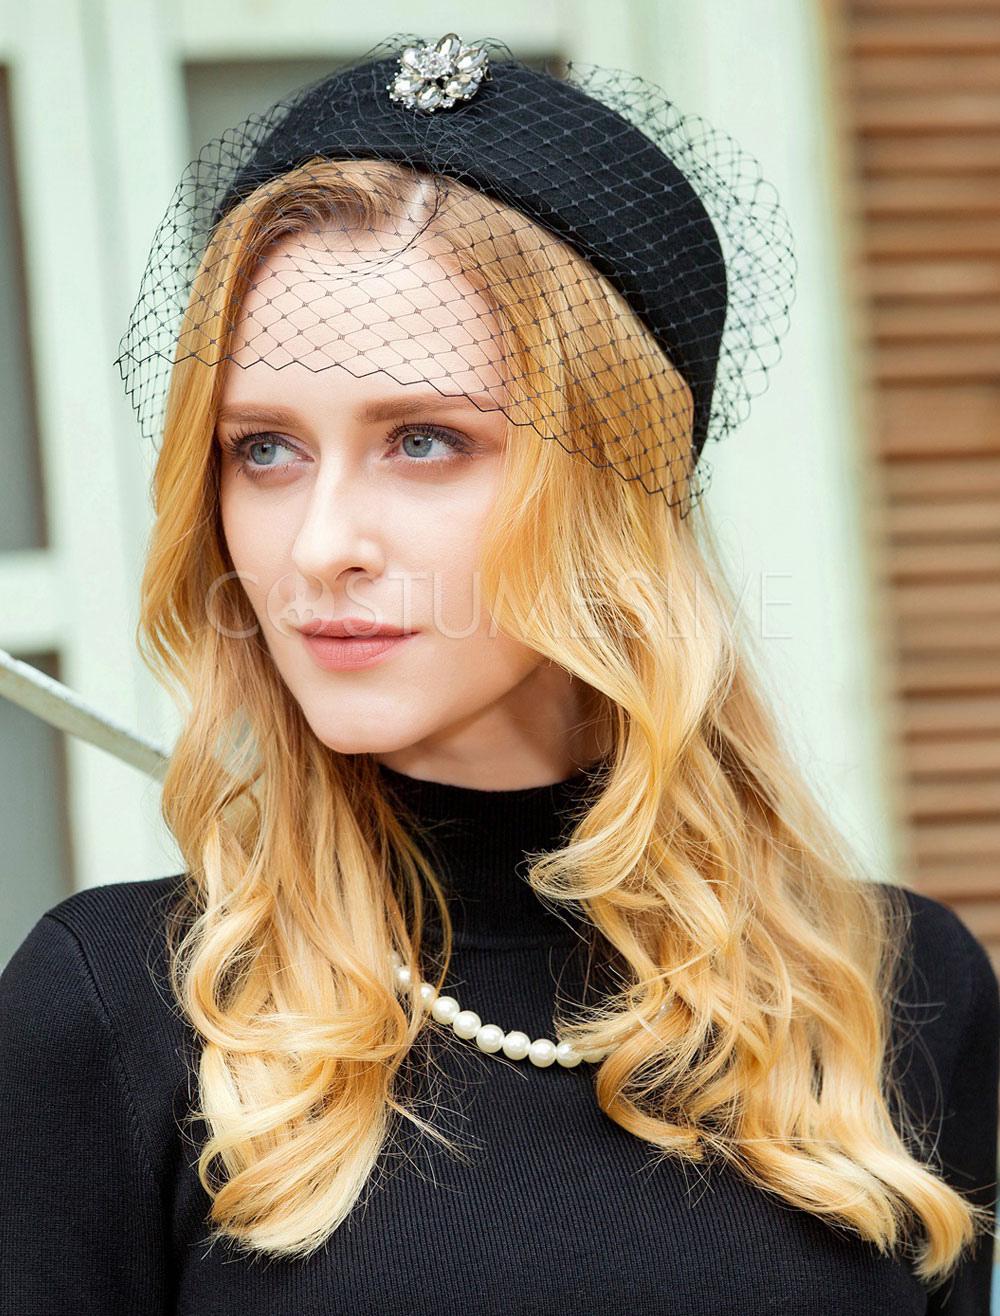 1e98f77ad Vintage Fascinator Hat Wool Black Winter Felt Hats For Women